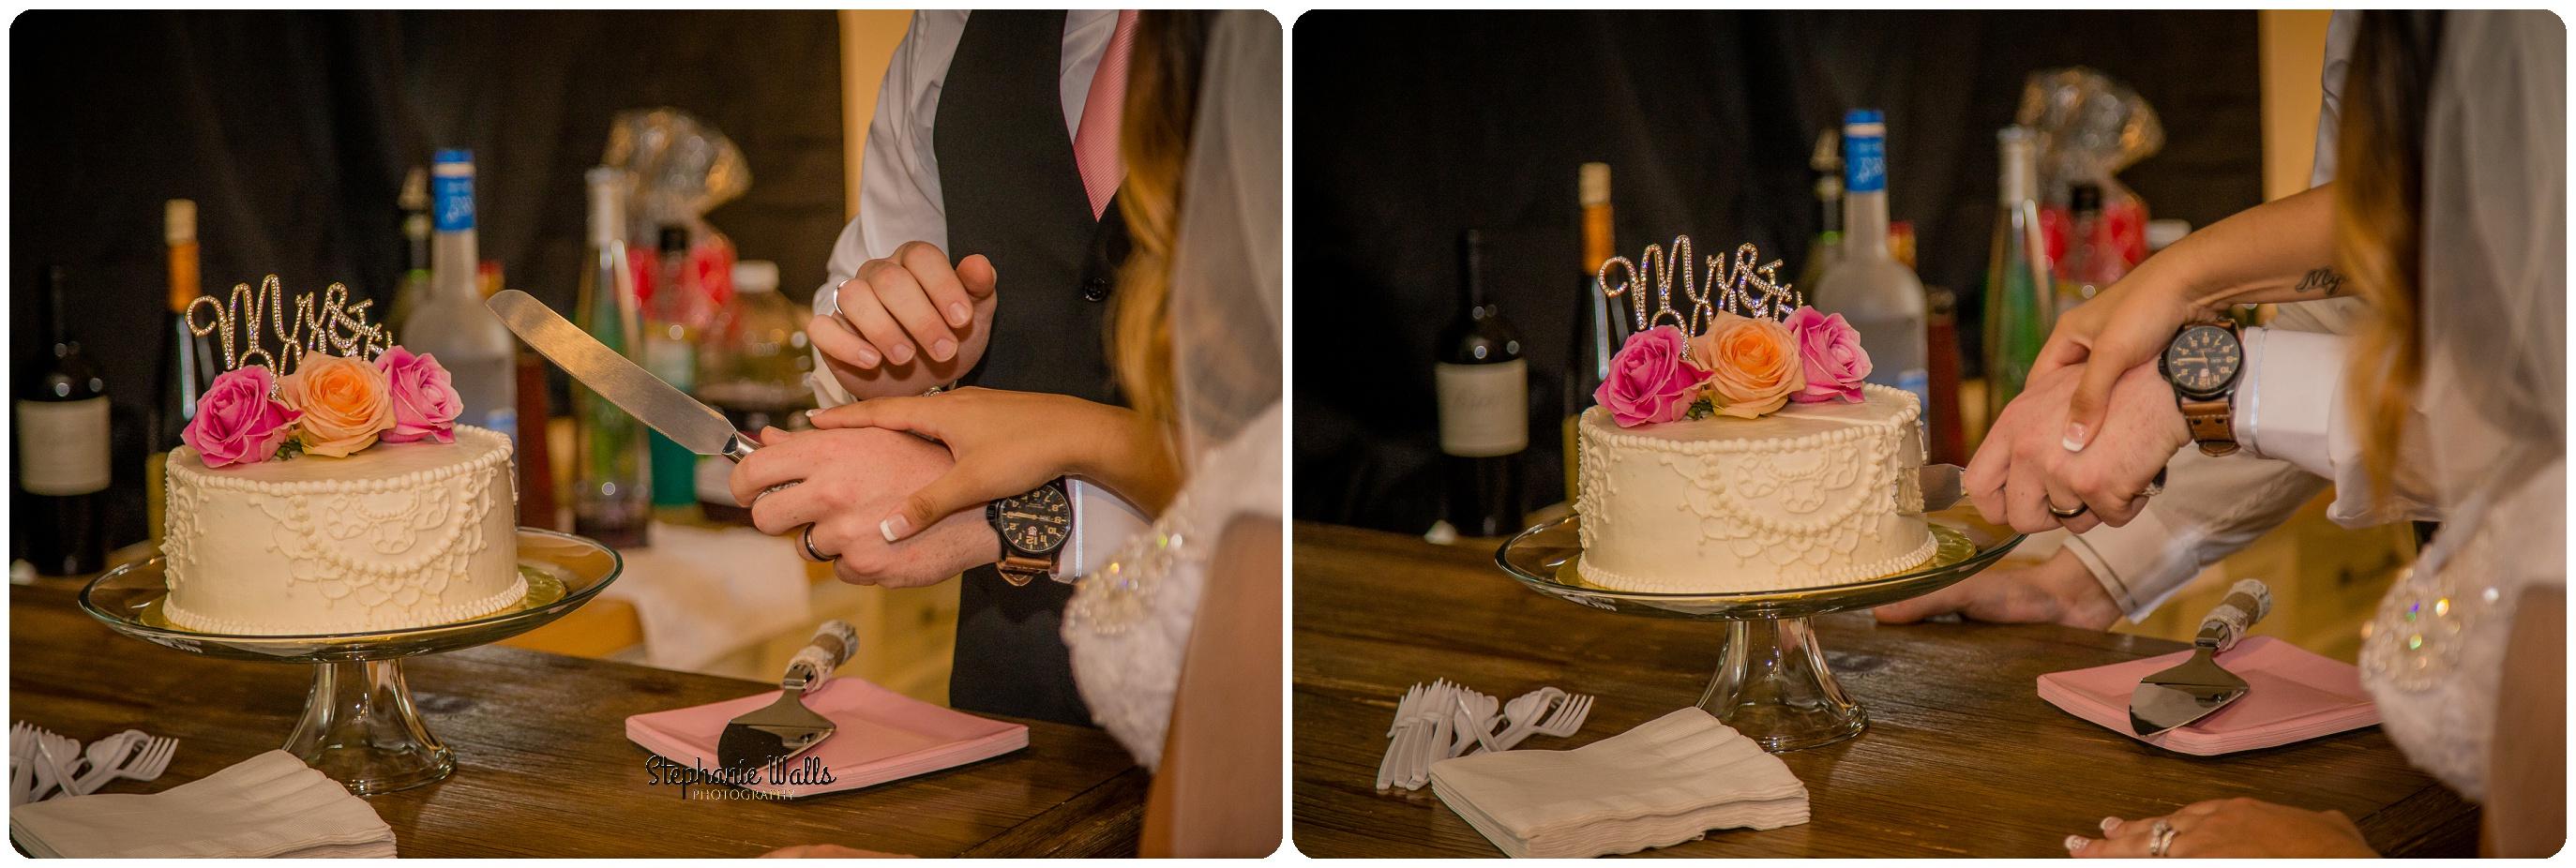 Miller Wedding476 WHERE EVER YOU GO | MAPLEHURST FARMS GUESTHOUSE | STEPHANIE WALLS PHOTOGRAPHY